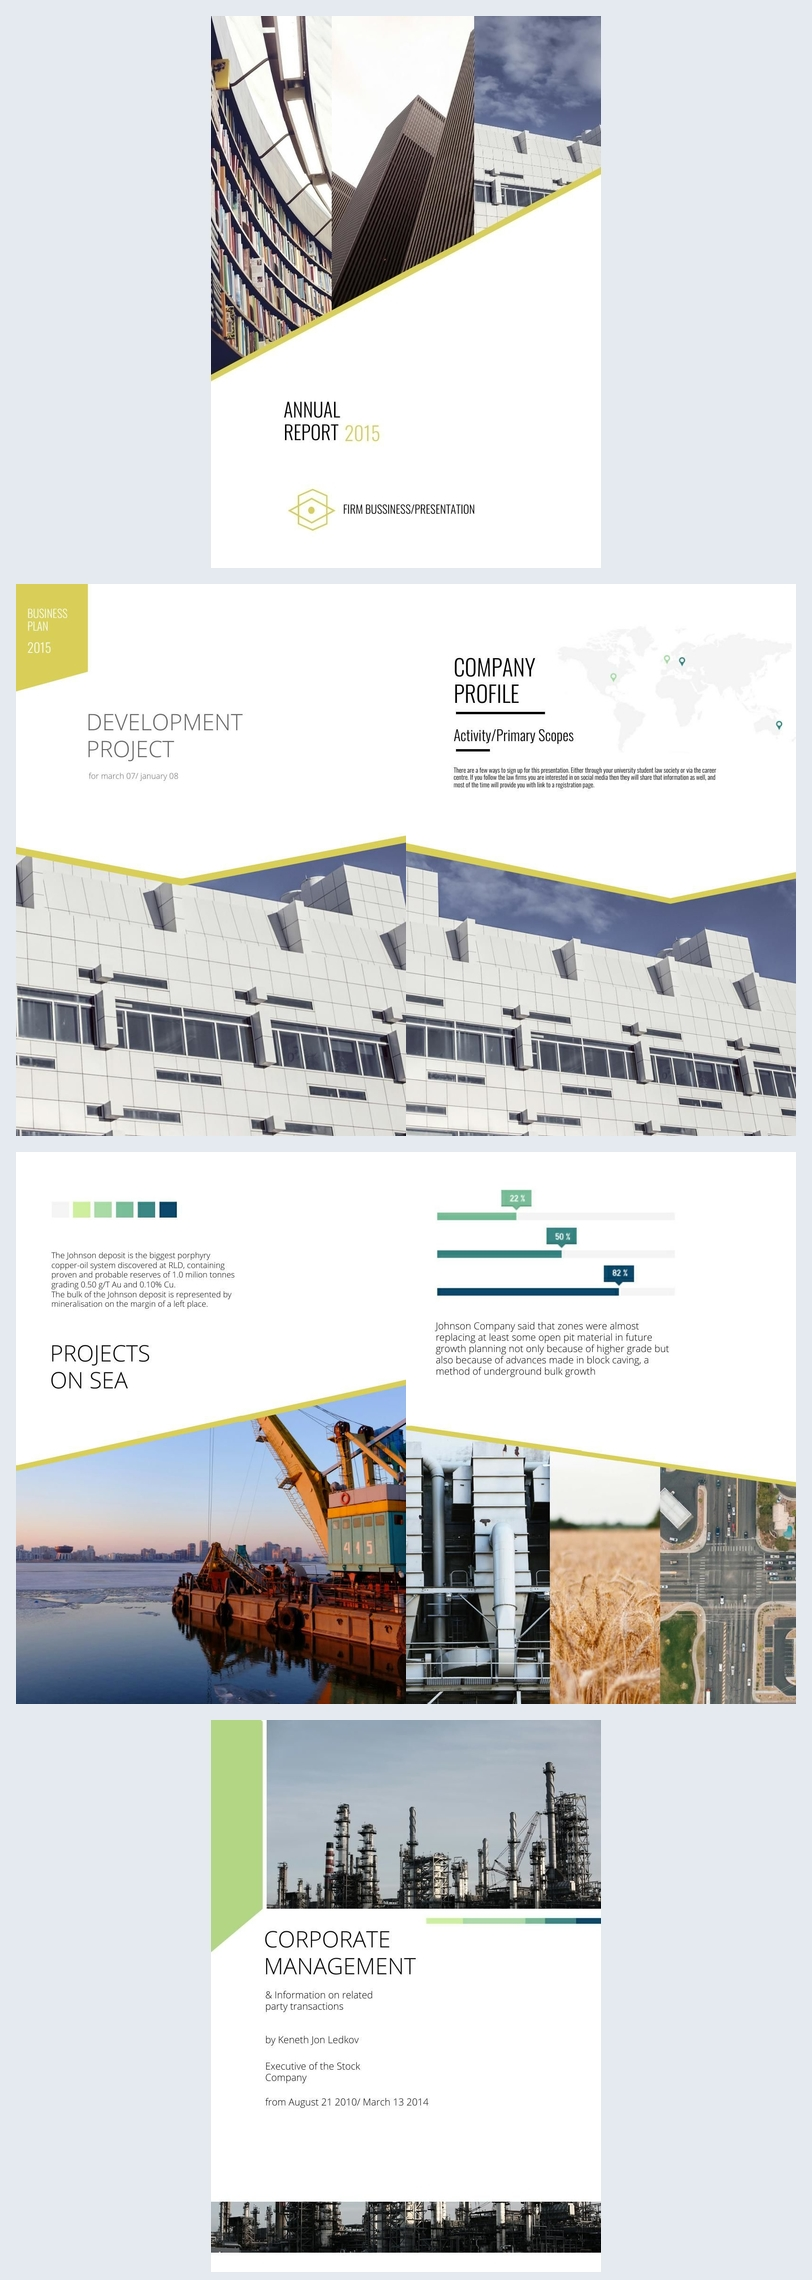 Business Annual Report Design